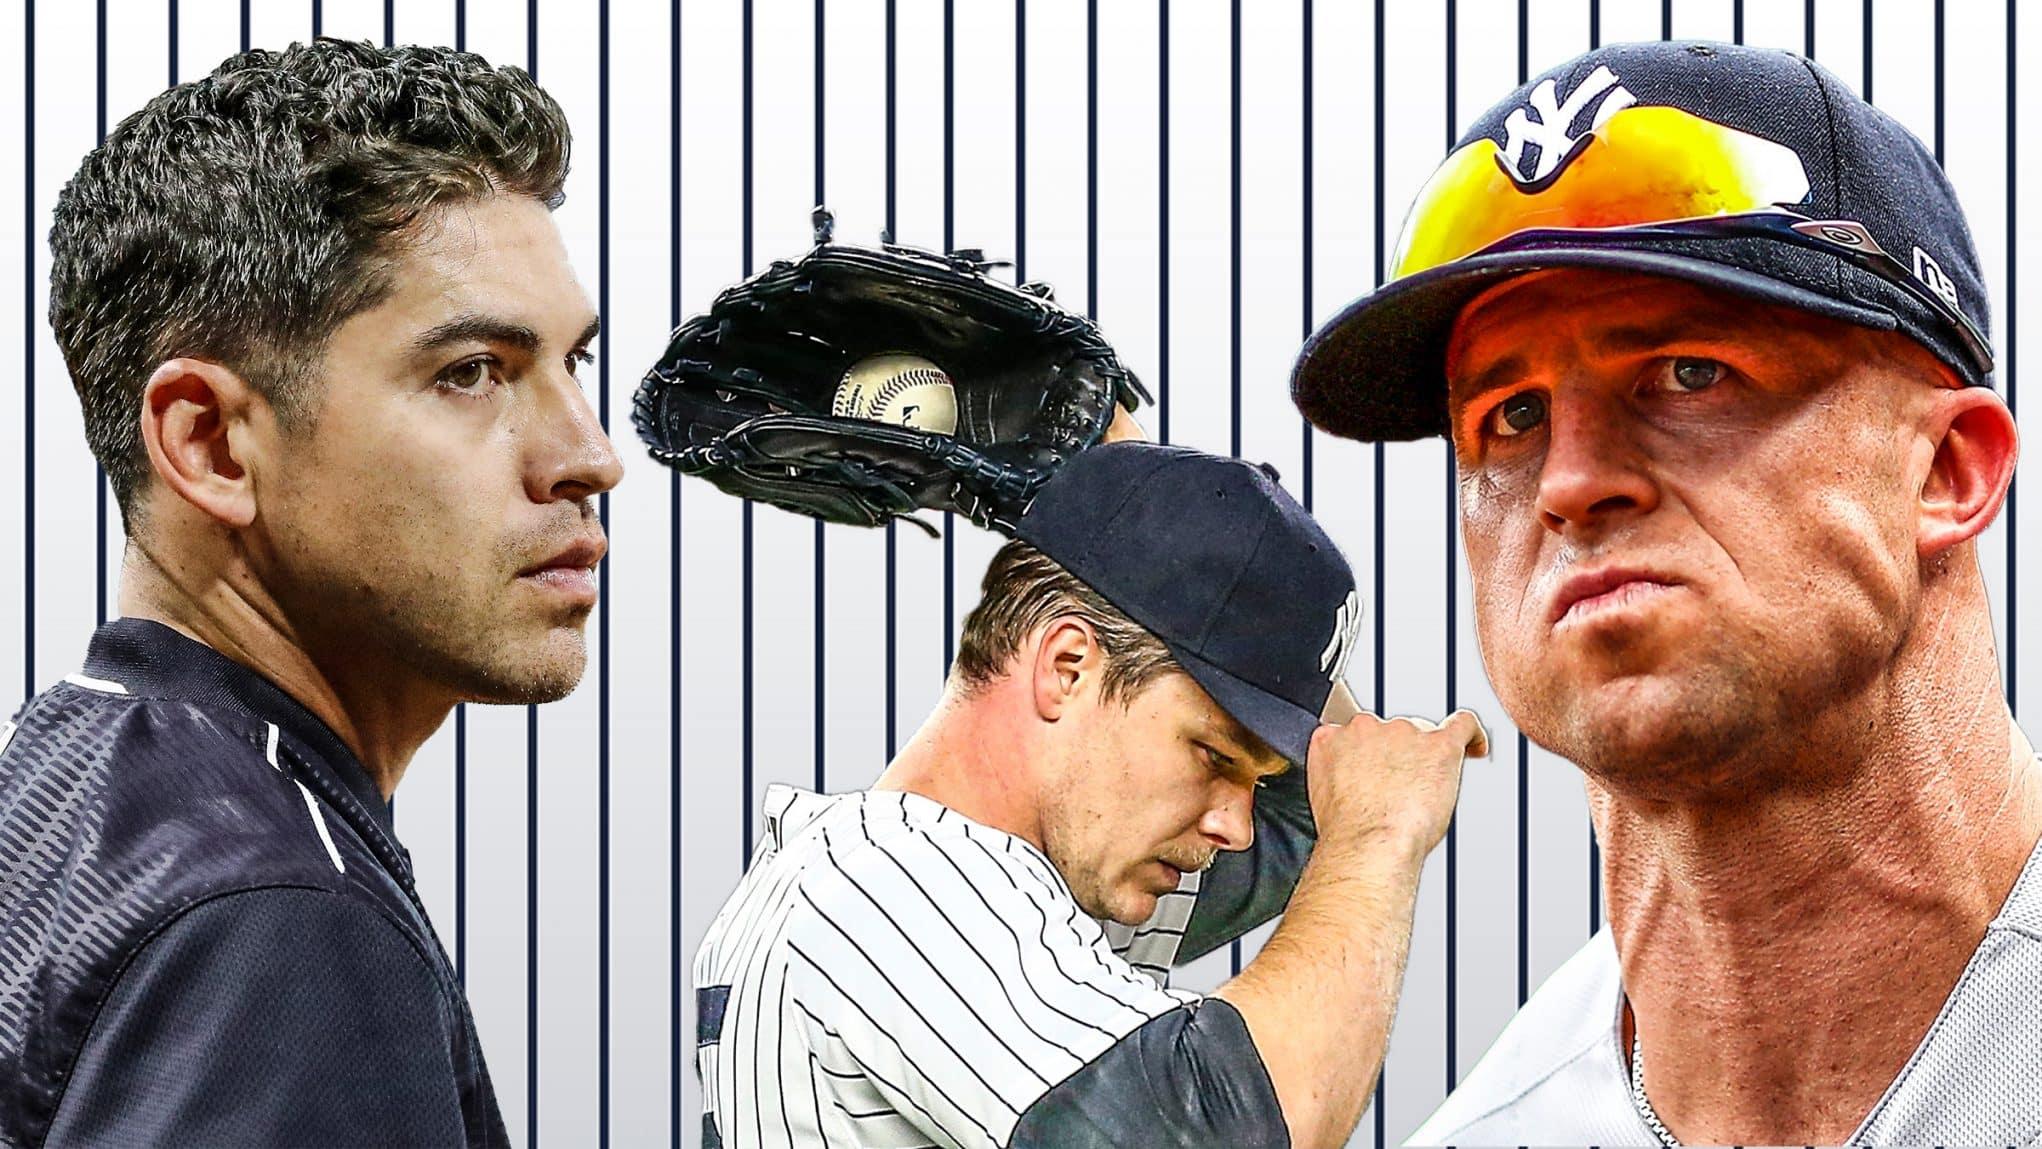 New York Yankees Curse